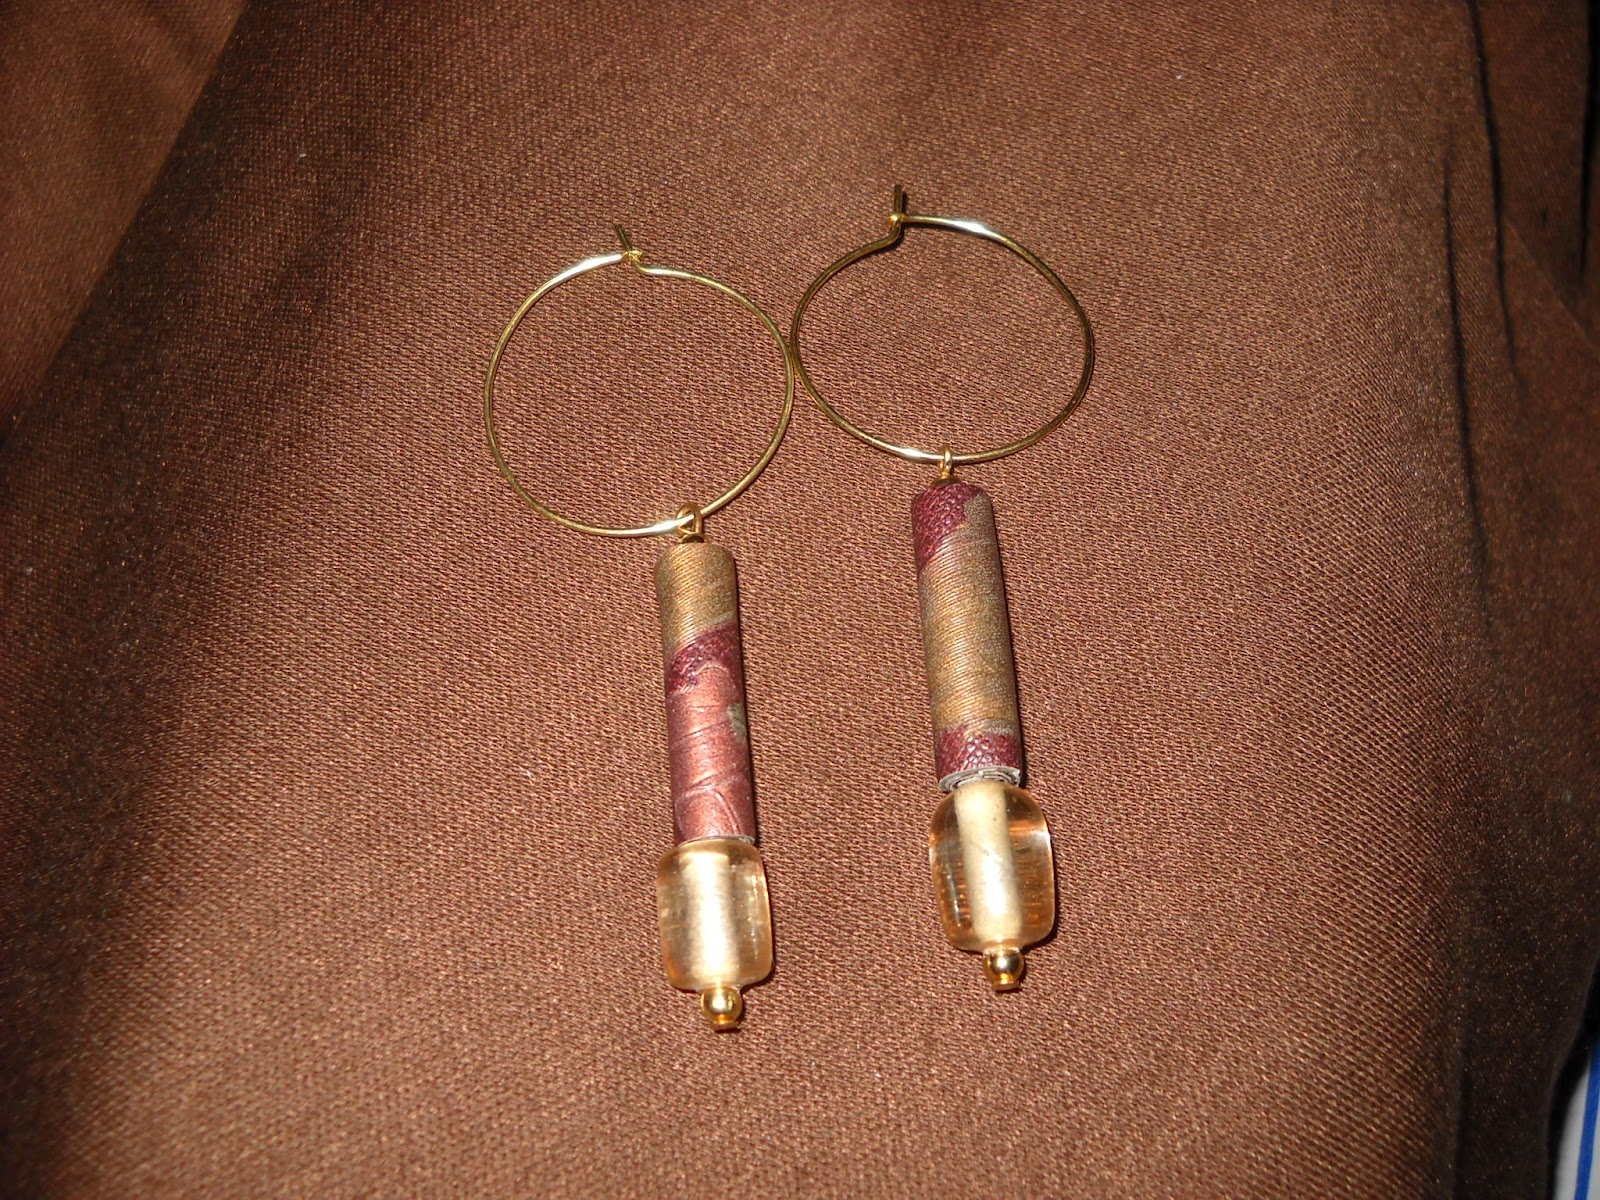 http://1.bp.blogspot.com/-yrt65SycVZE/Ty9TgqA3C1I/AAAAAAAABH8/32hT3asNBow/s1600/Paper+Bead+Earrings+1.jpg